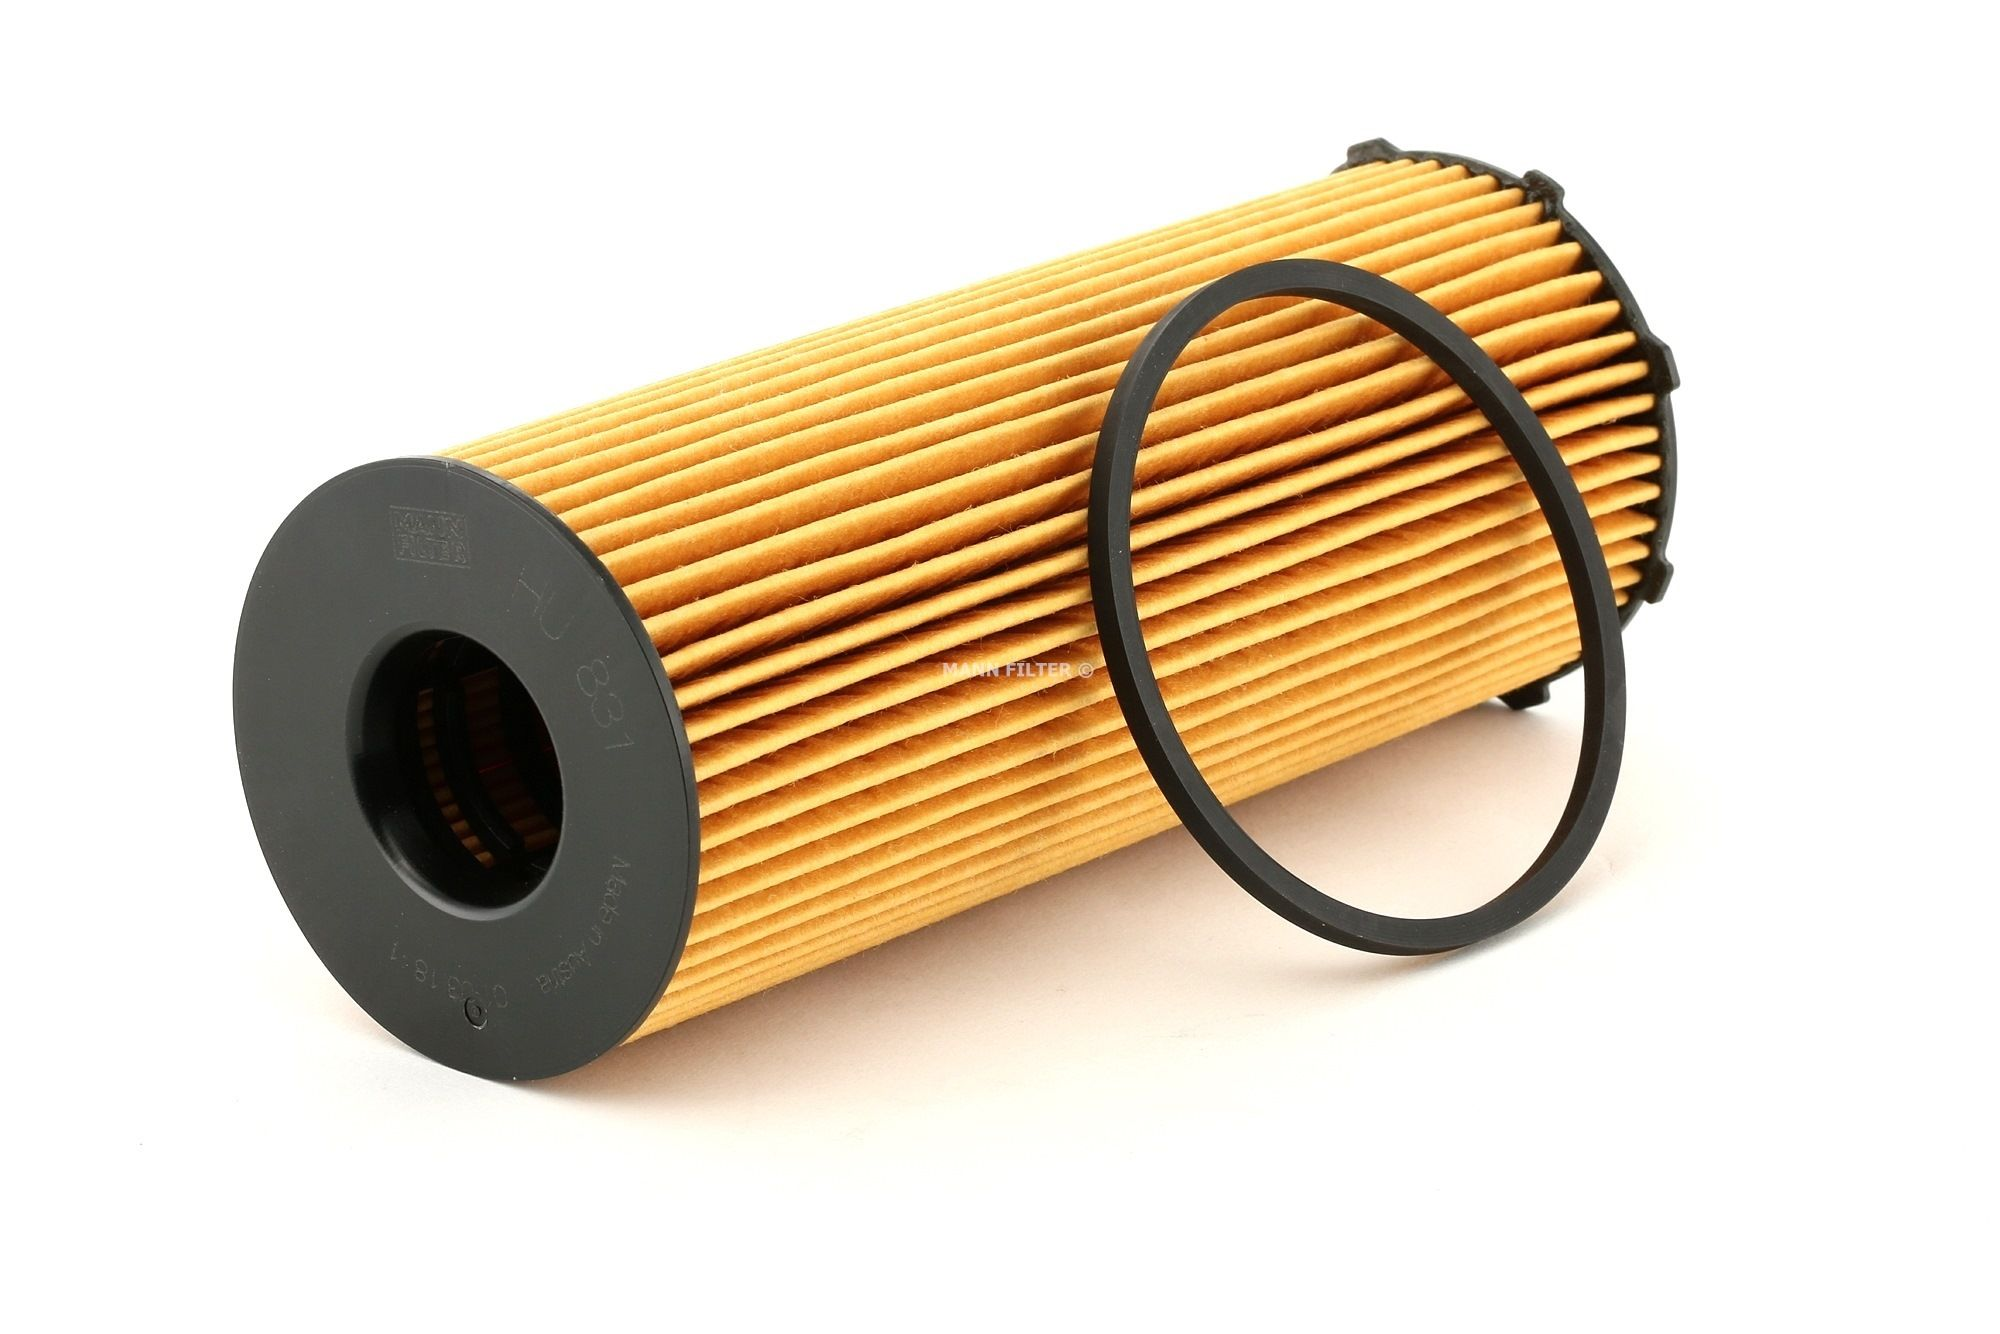 MANN-FILTER: Original Filteranlage HU 831 x (Innendurchmesser: 29mm, Innendurchmesser 2: 29mm, Ø: 72mm, Höhe: 200mm)